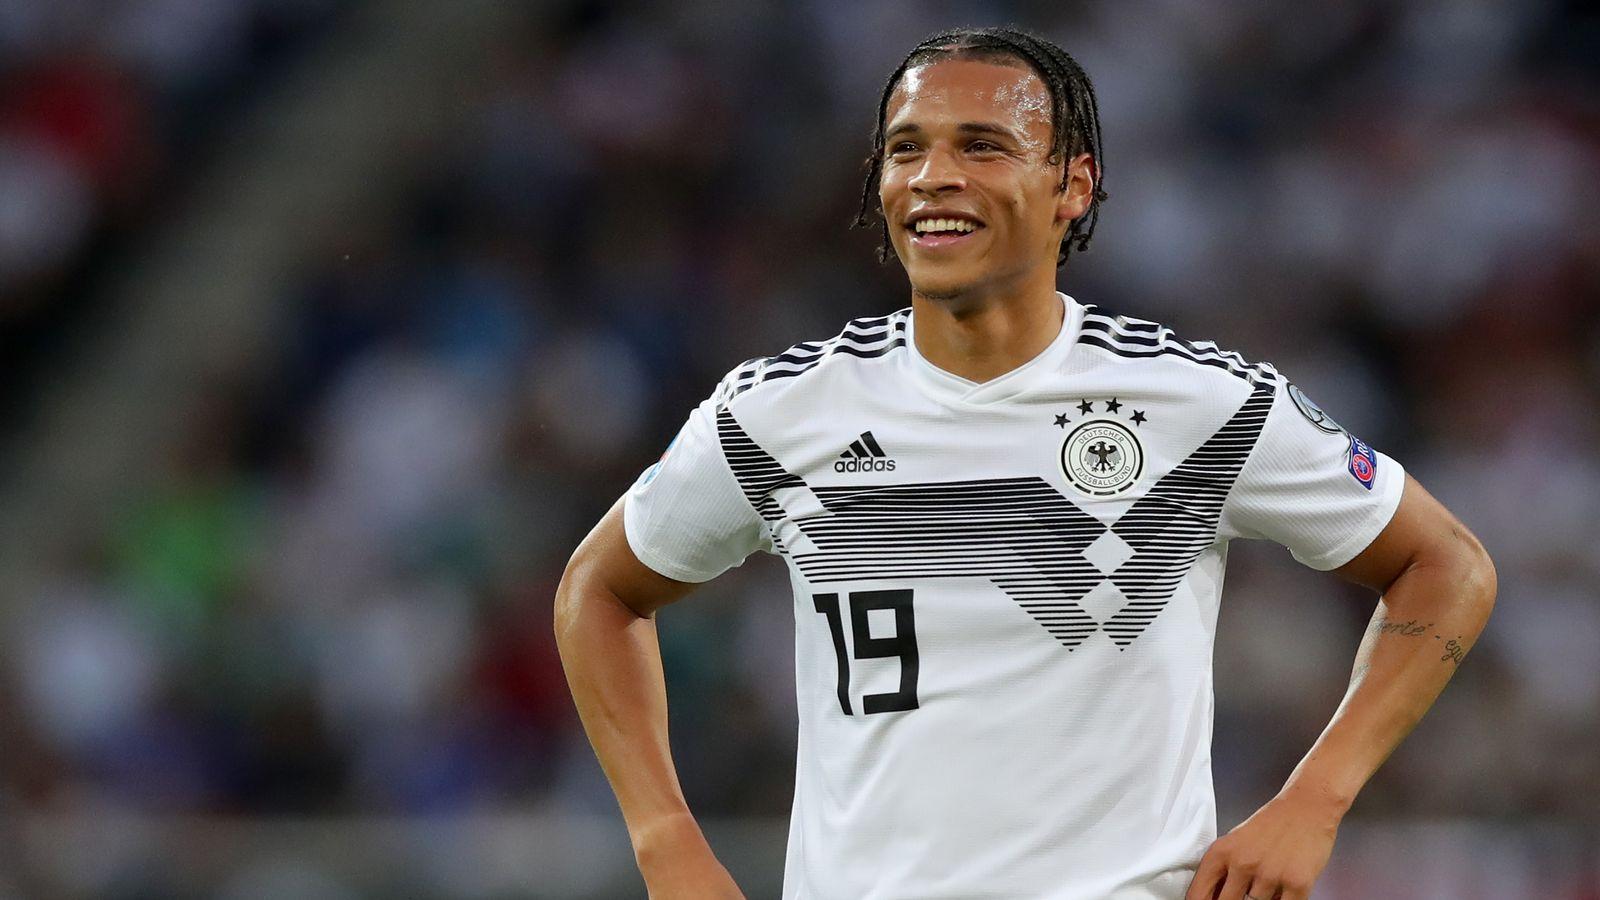 Bayern Munich's German players 'looking forward' to Leroy